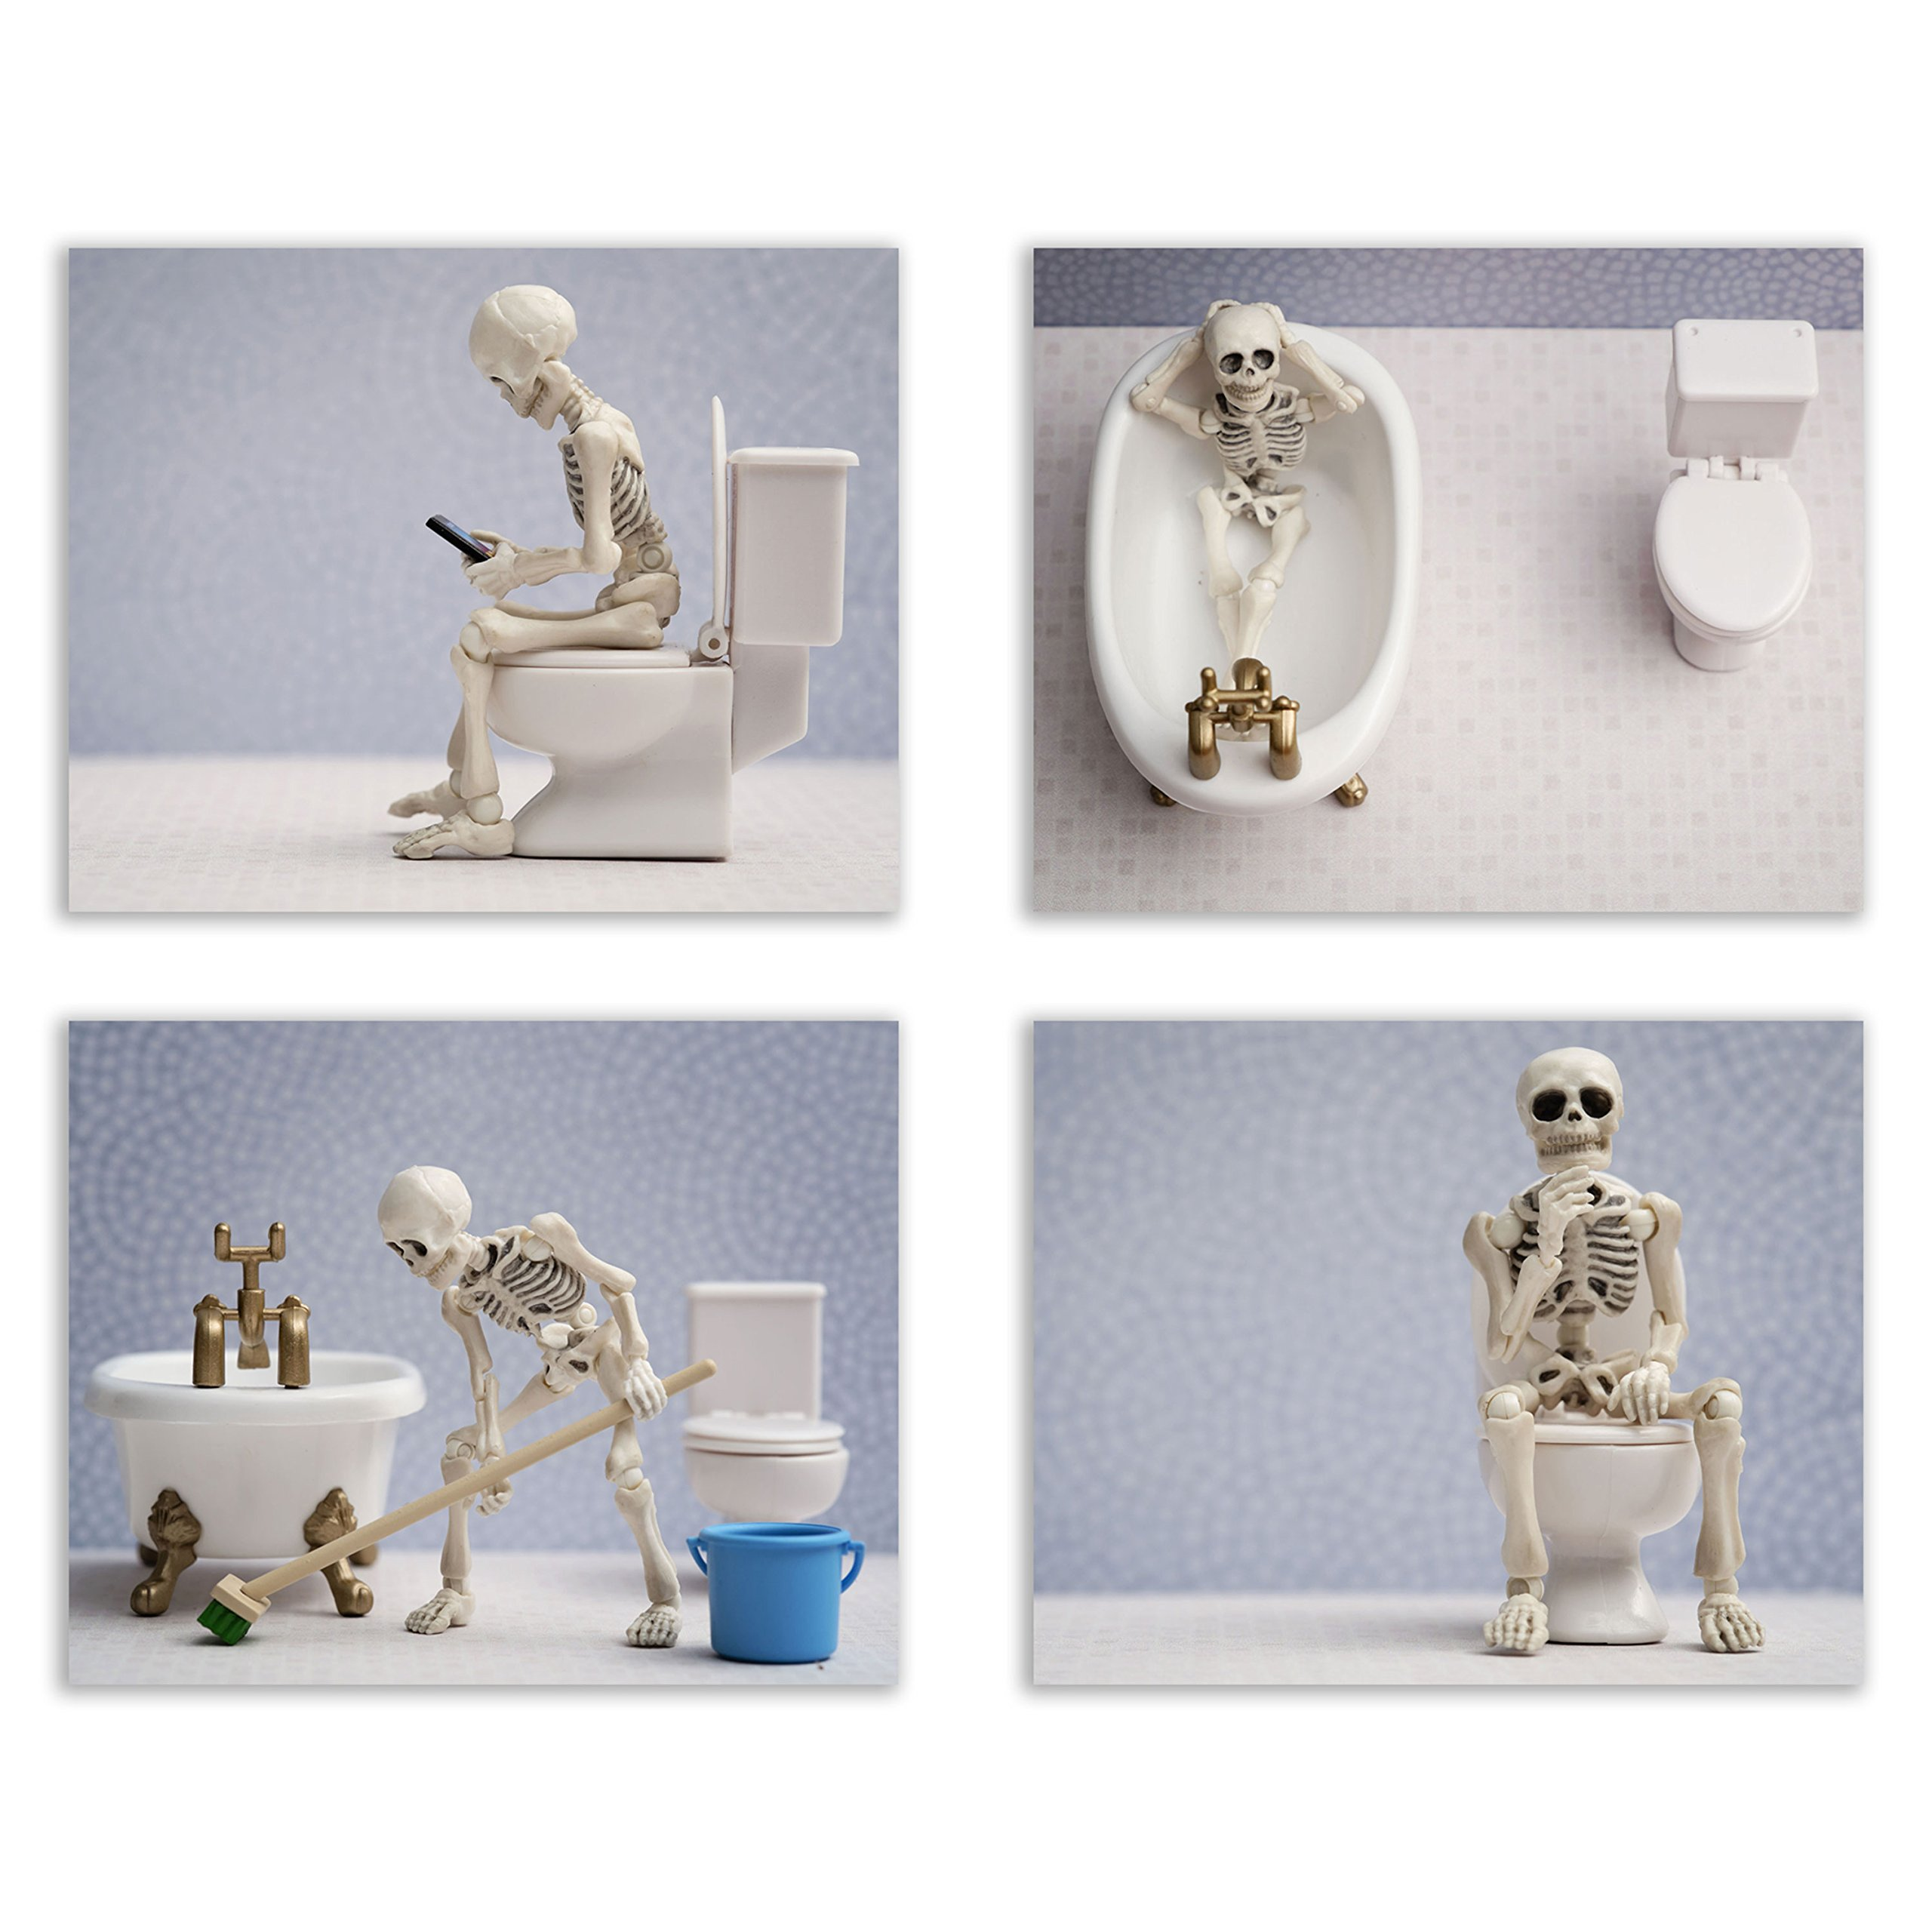 Skeleton Bathroom Prints – Funny Hipster Skull and Bones Wall Art Decor – Set of 4 (8 x 10) Photos